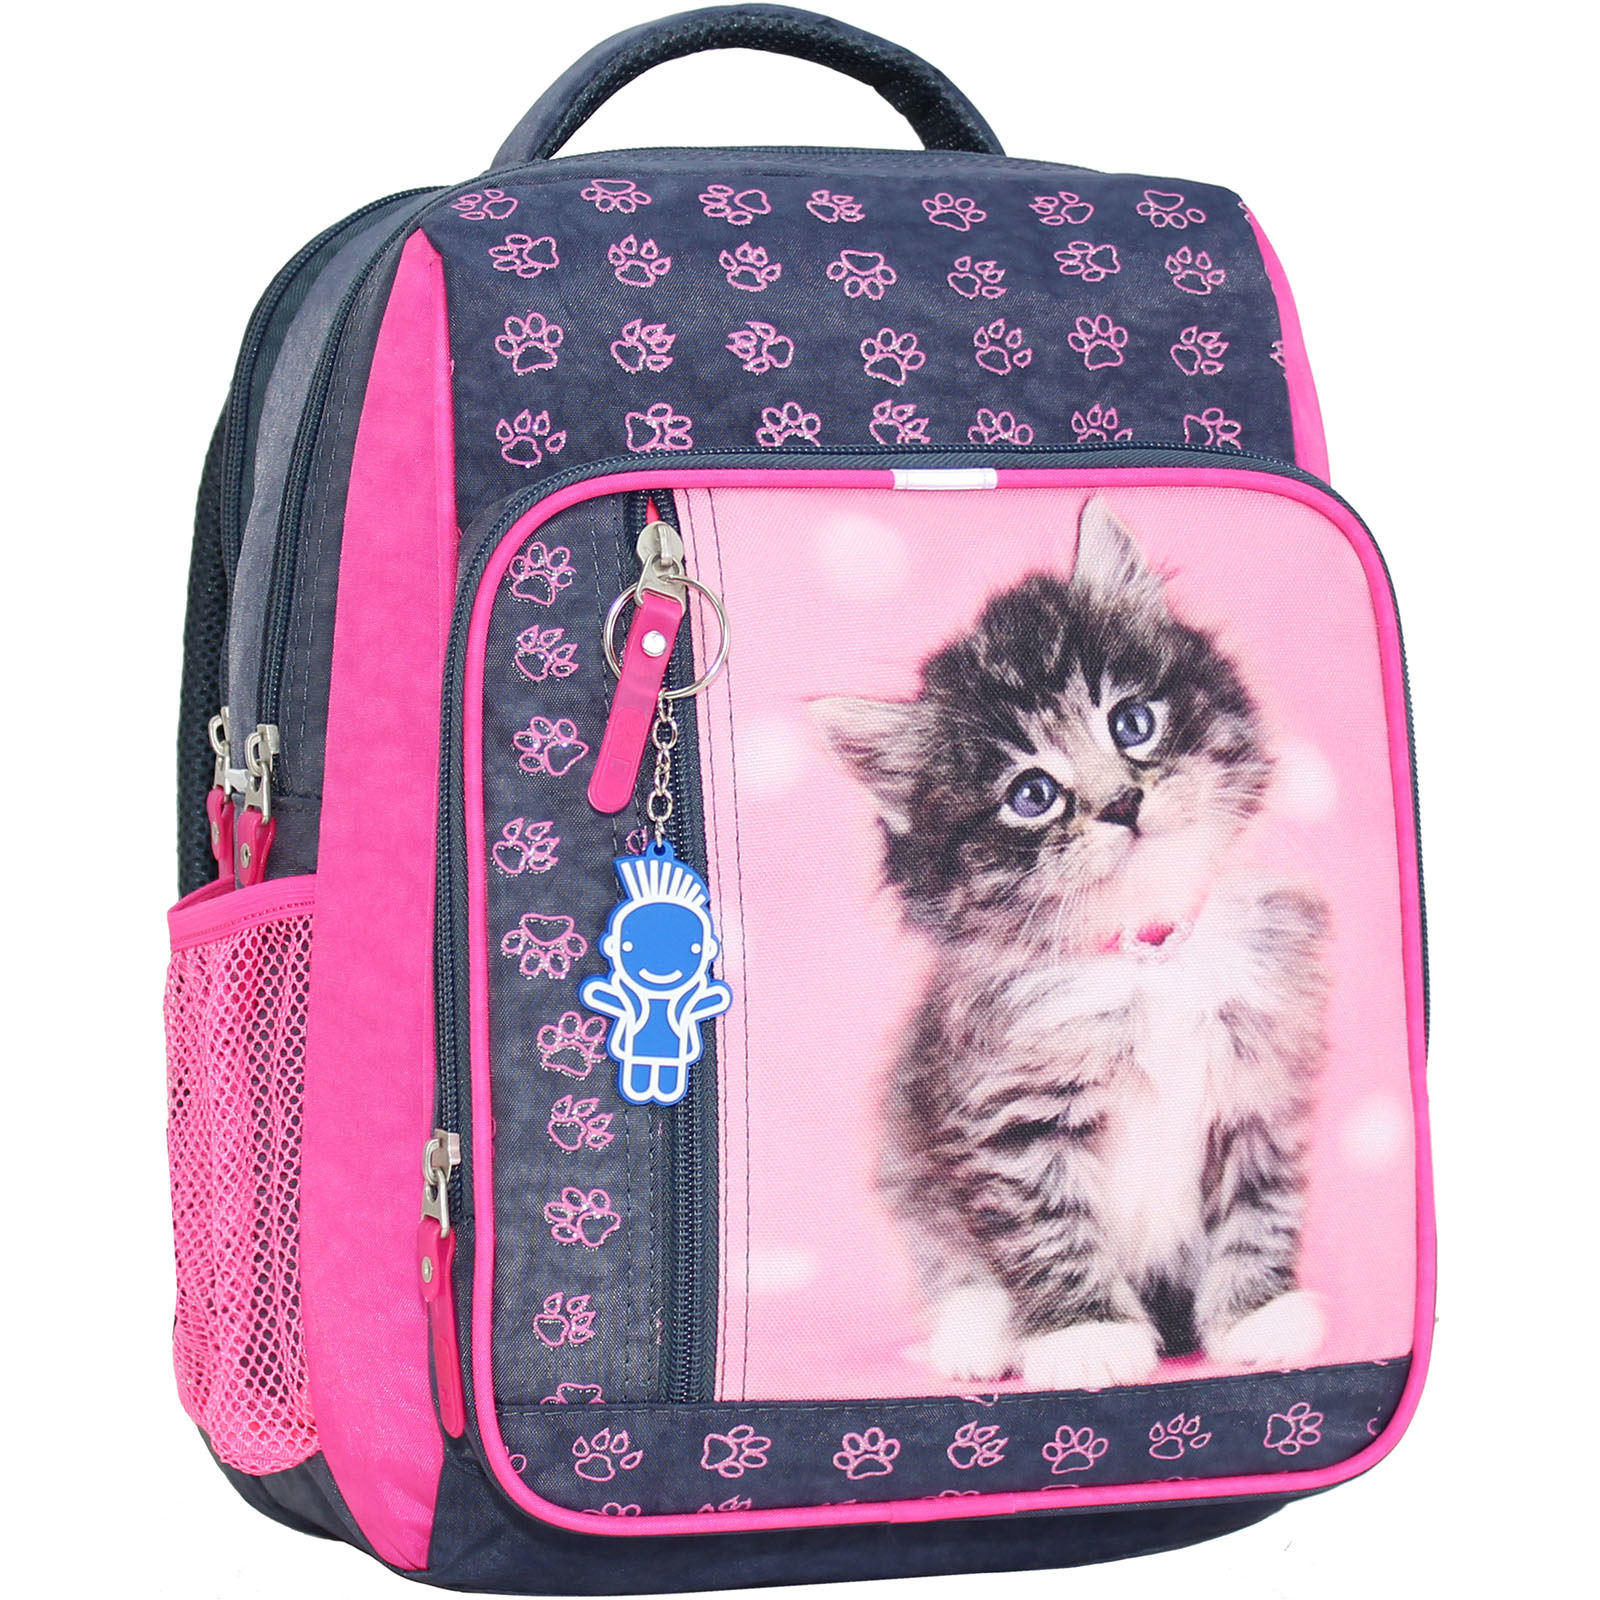 Школьные рюкзаки Рюкзак школьный Bagland Школьник 8 л. Серый (кот 65) (00112702) IMG_9235_суб.65Д_.JPG